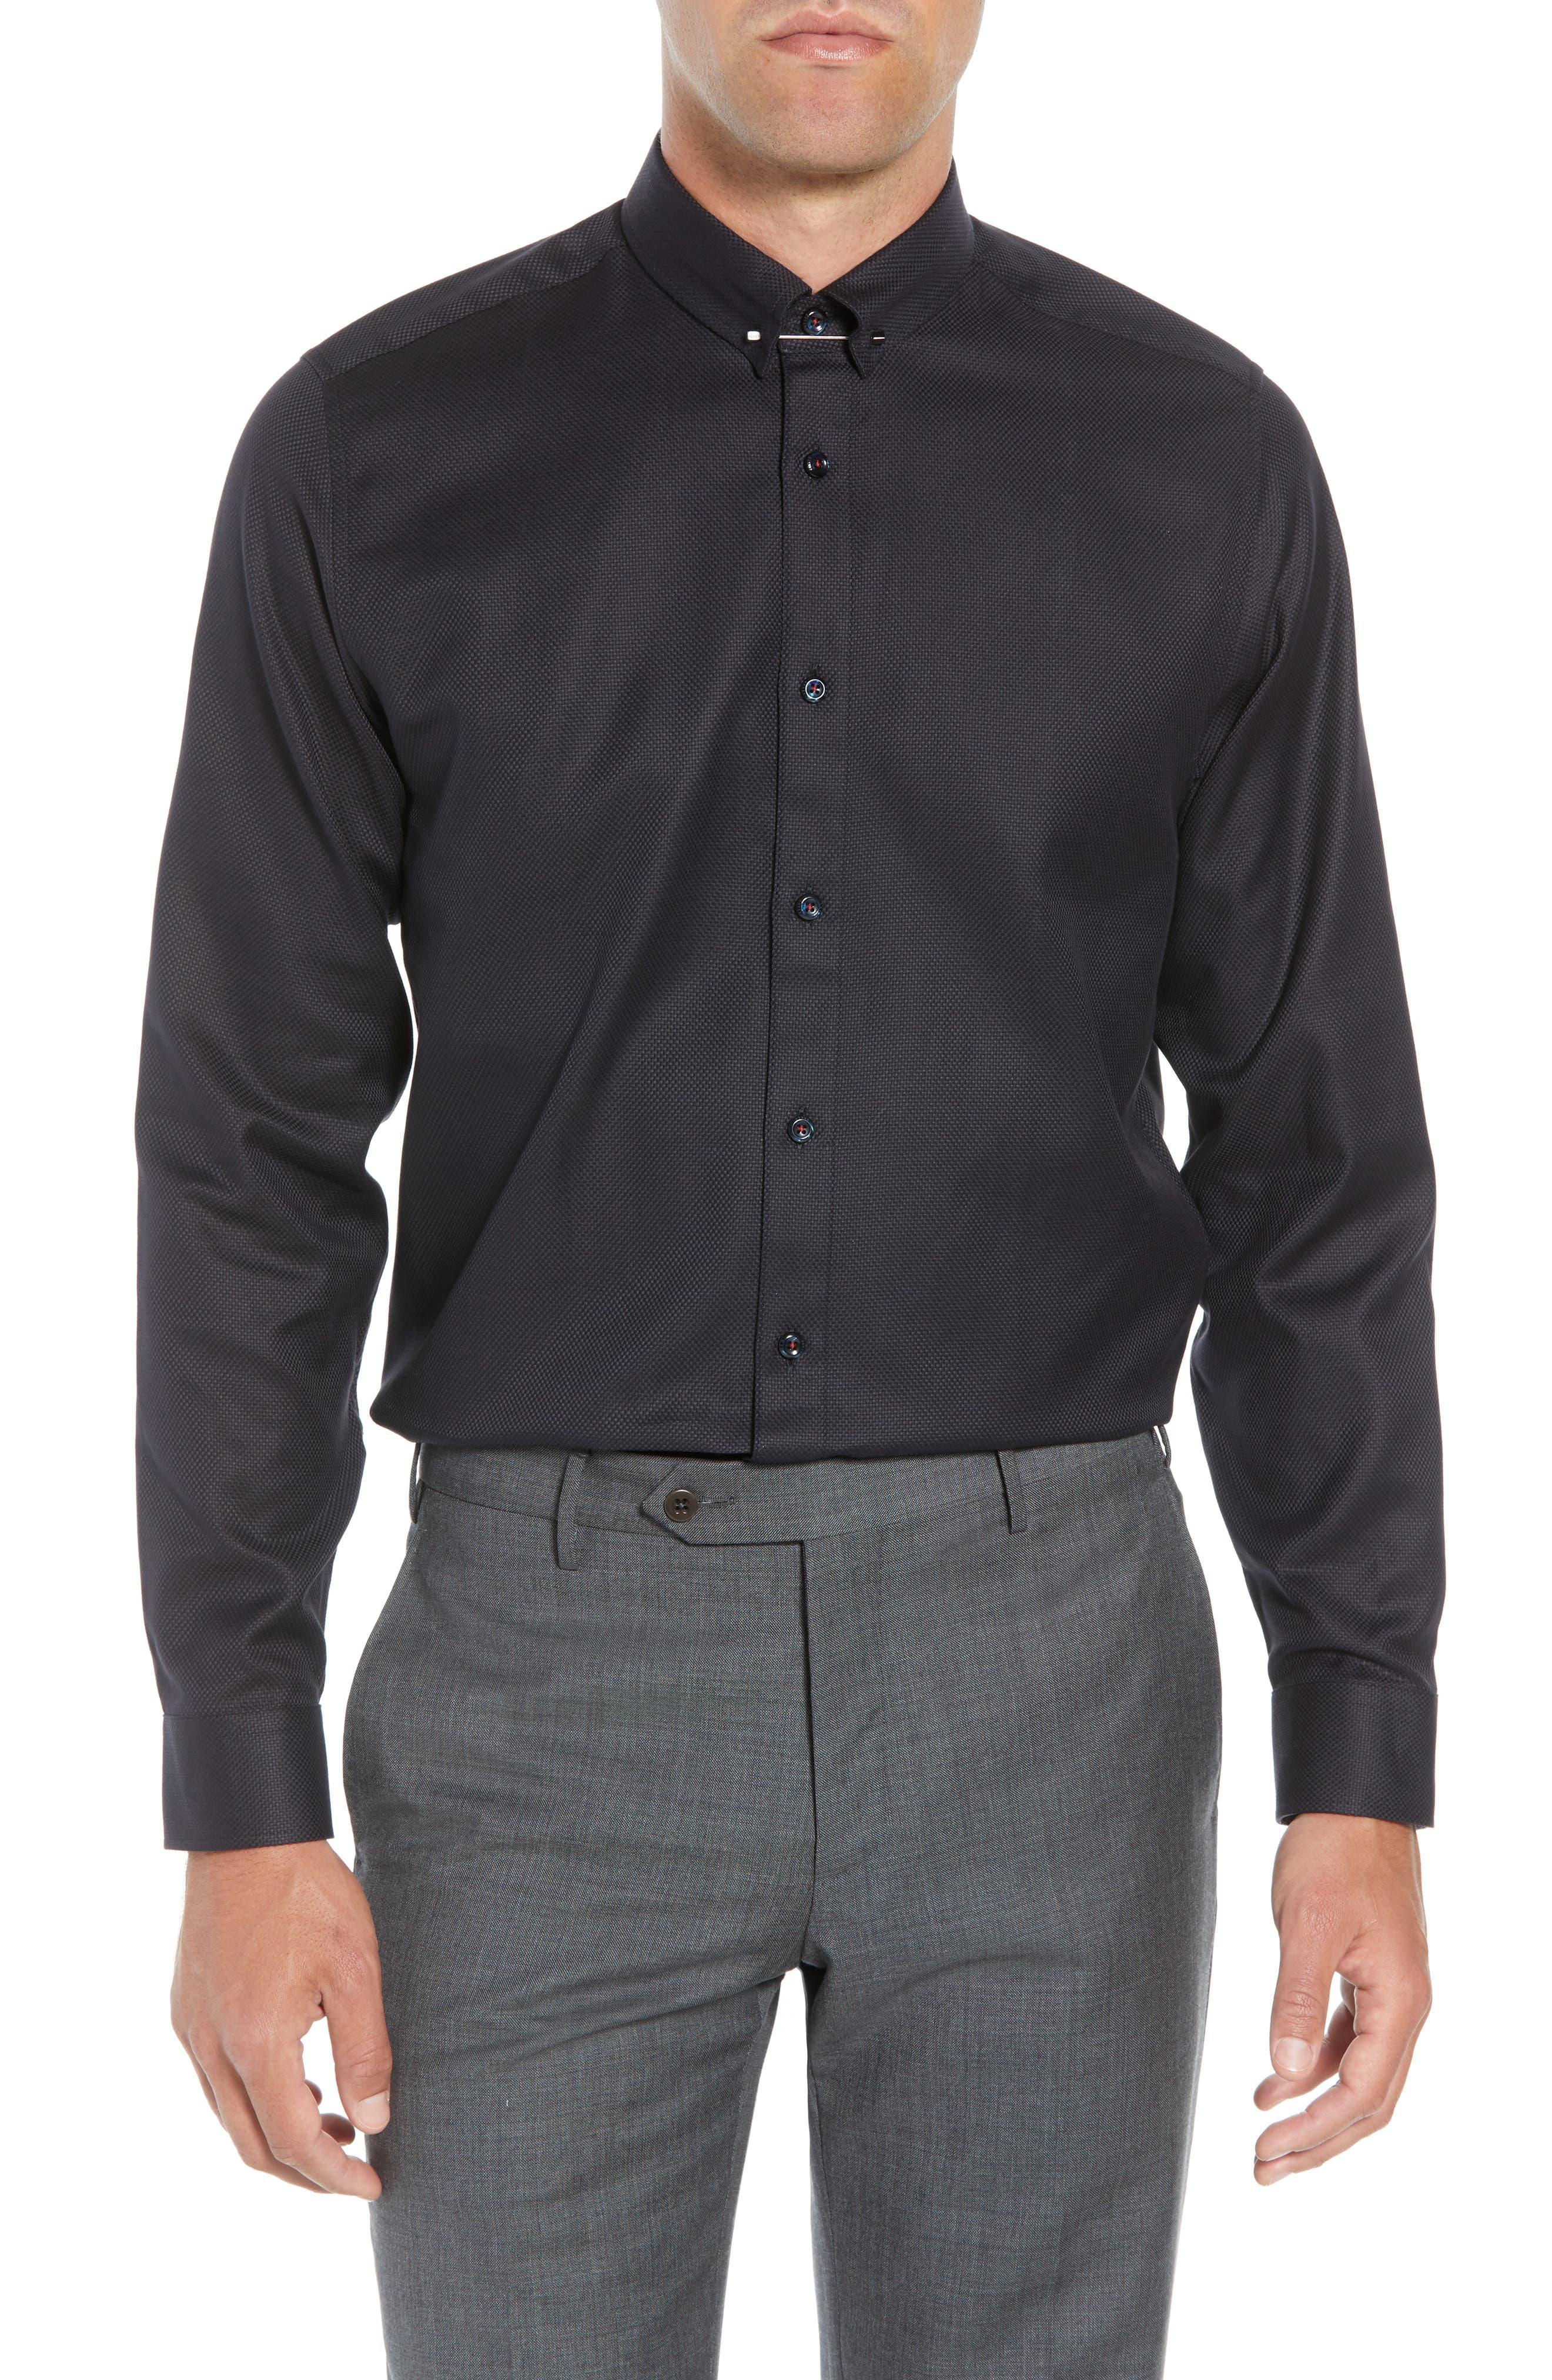 Leek Slim Fit Solid Dress Shirt,                             Main thumbnail 1, color,                             NAVY